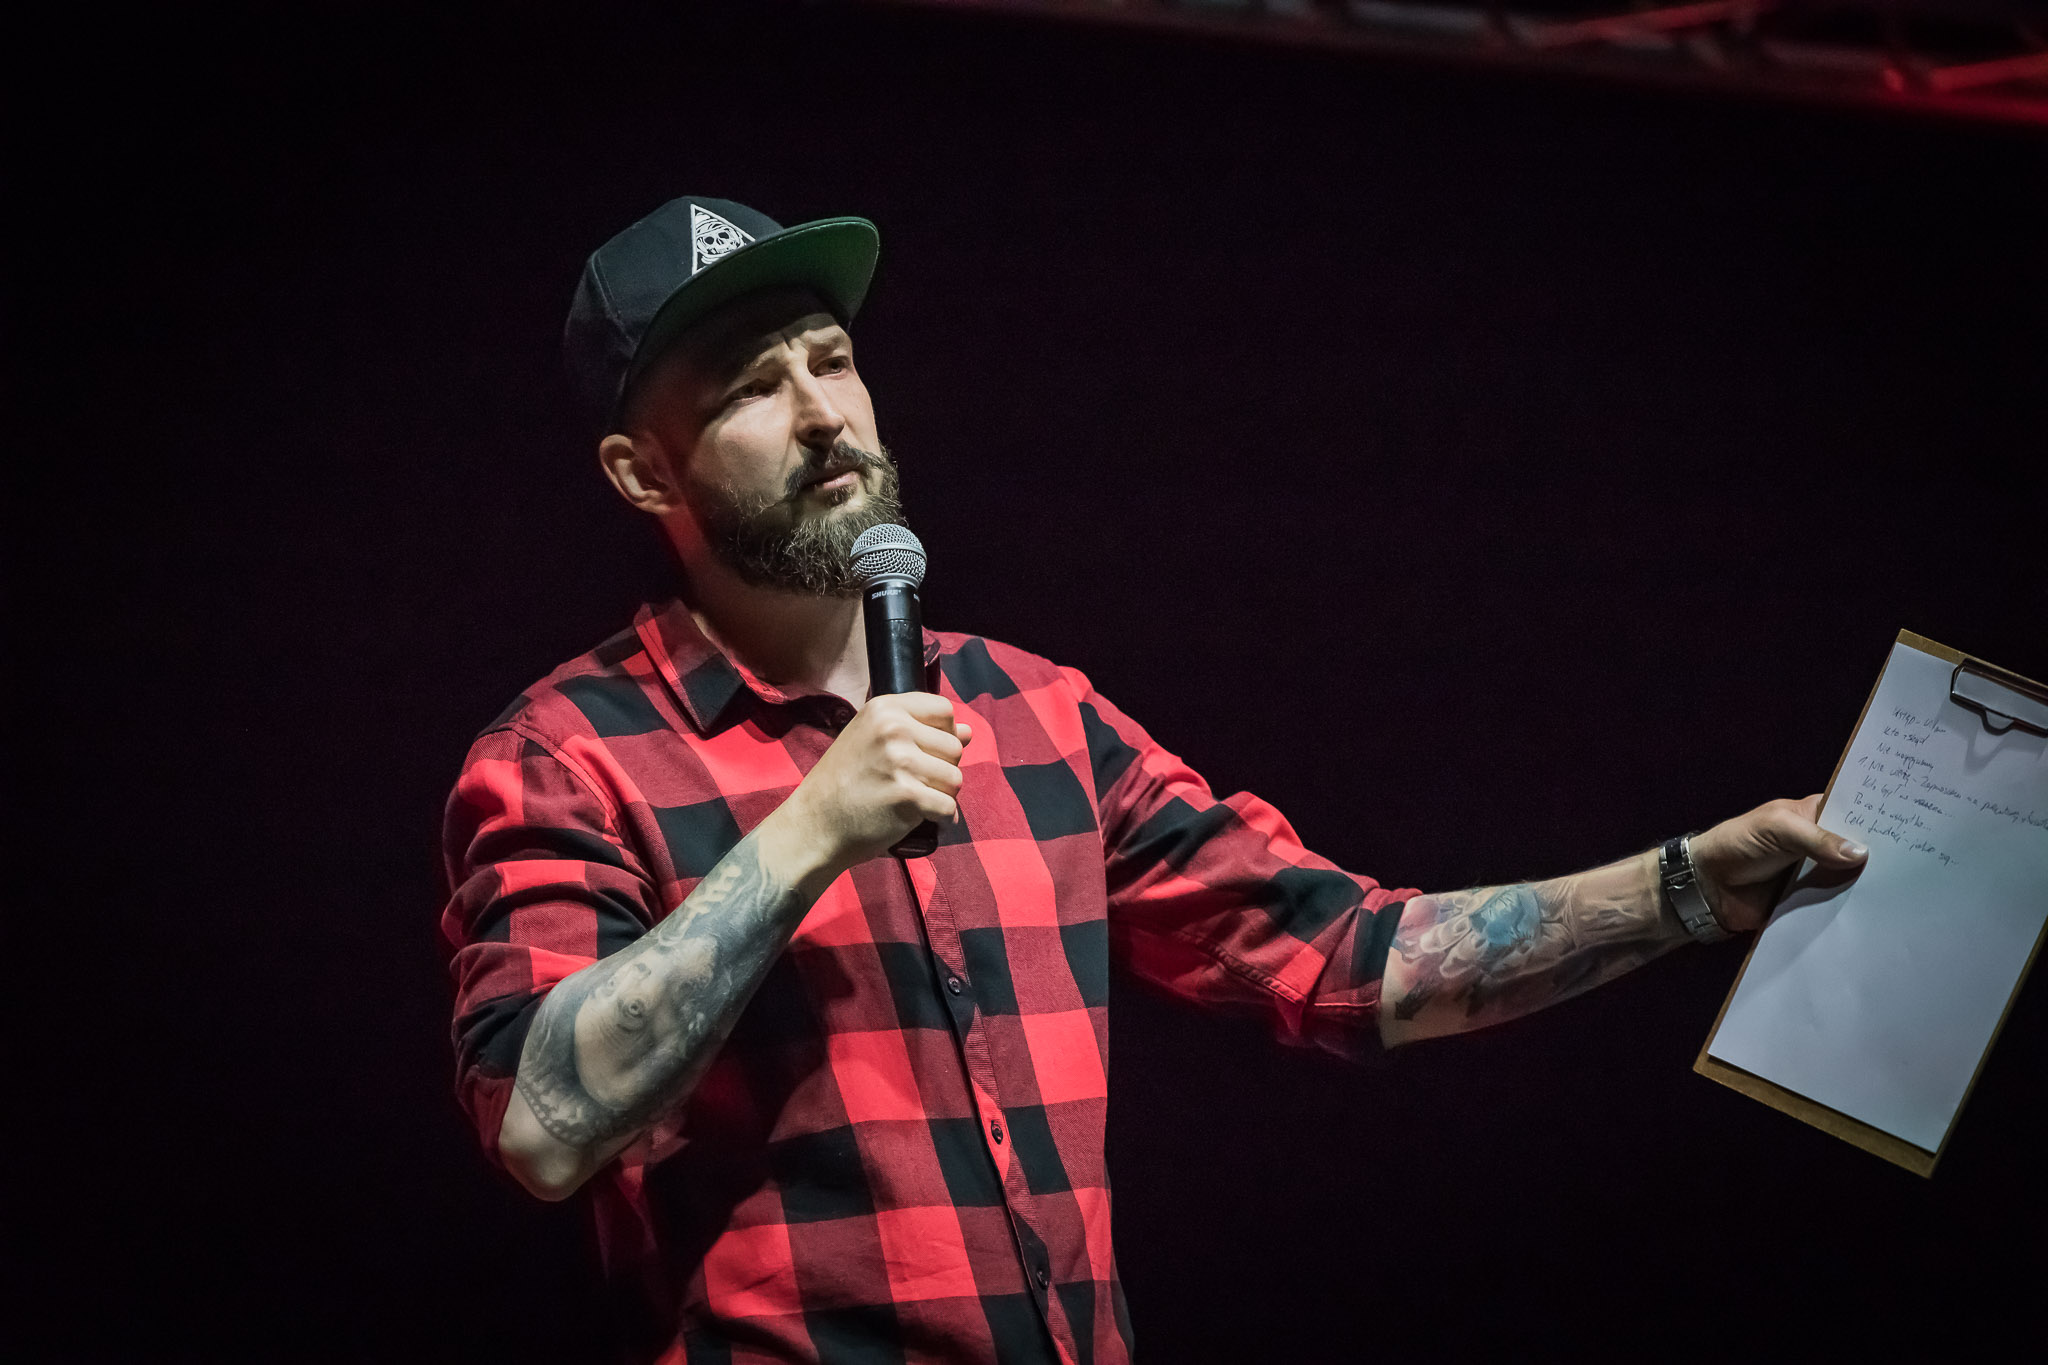 Adam Van Bendler - Stand-Up, Fundacja Psia Krew